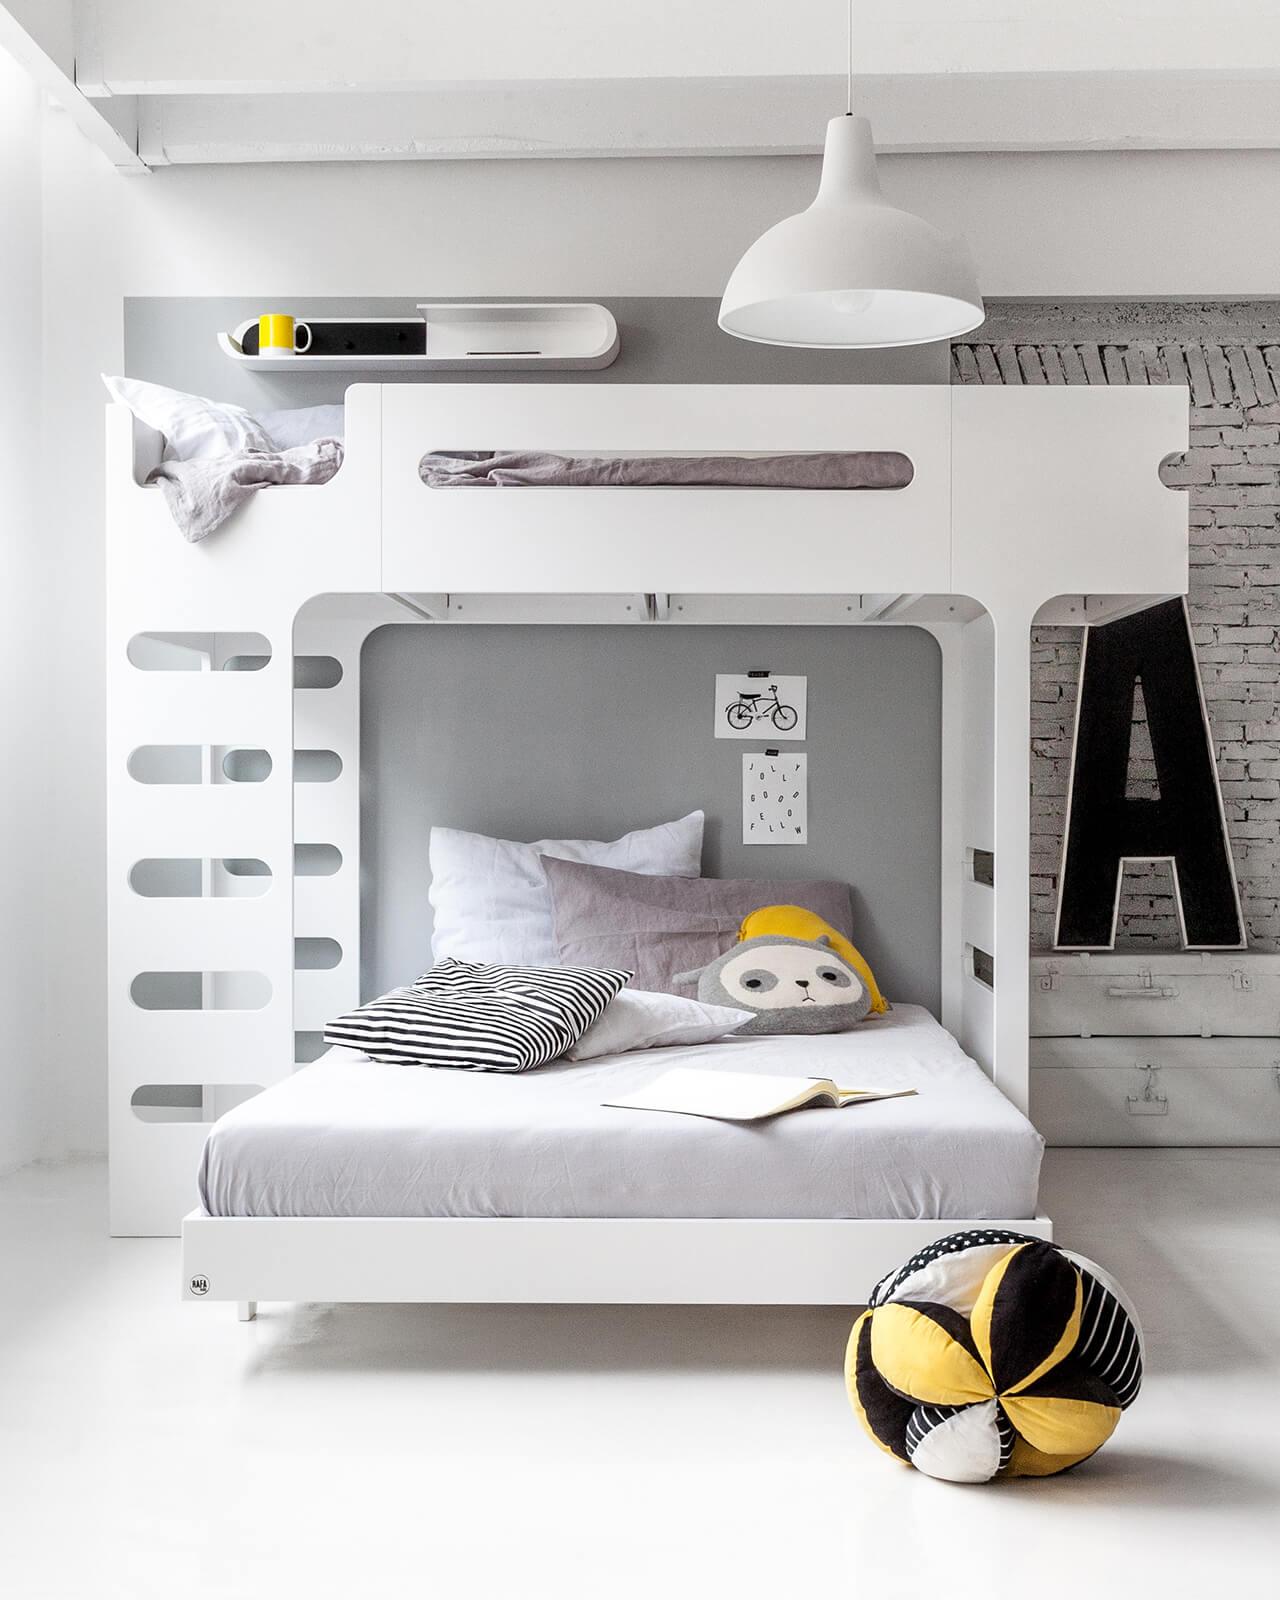 F&A120 Bunk Bed for 2 Children - Designer Furniture - Rafa-kids